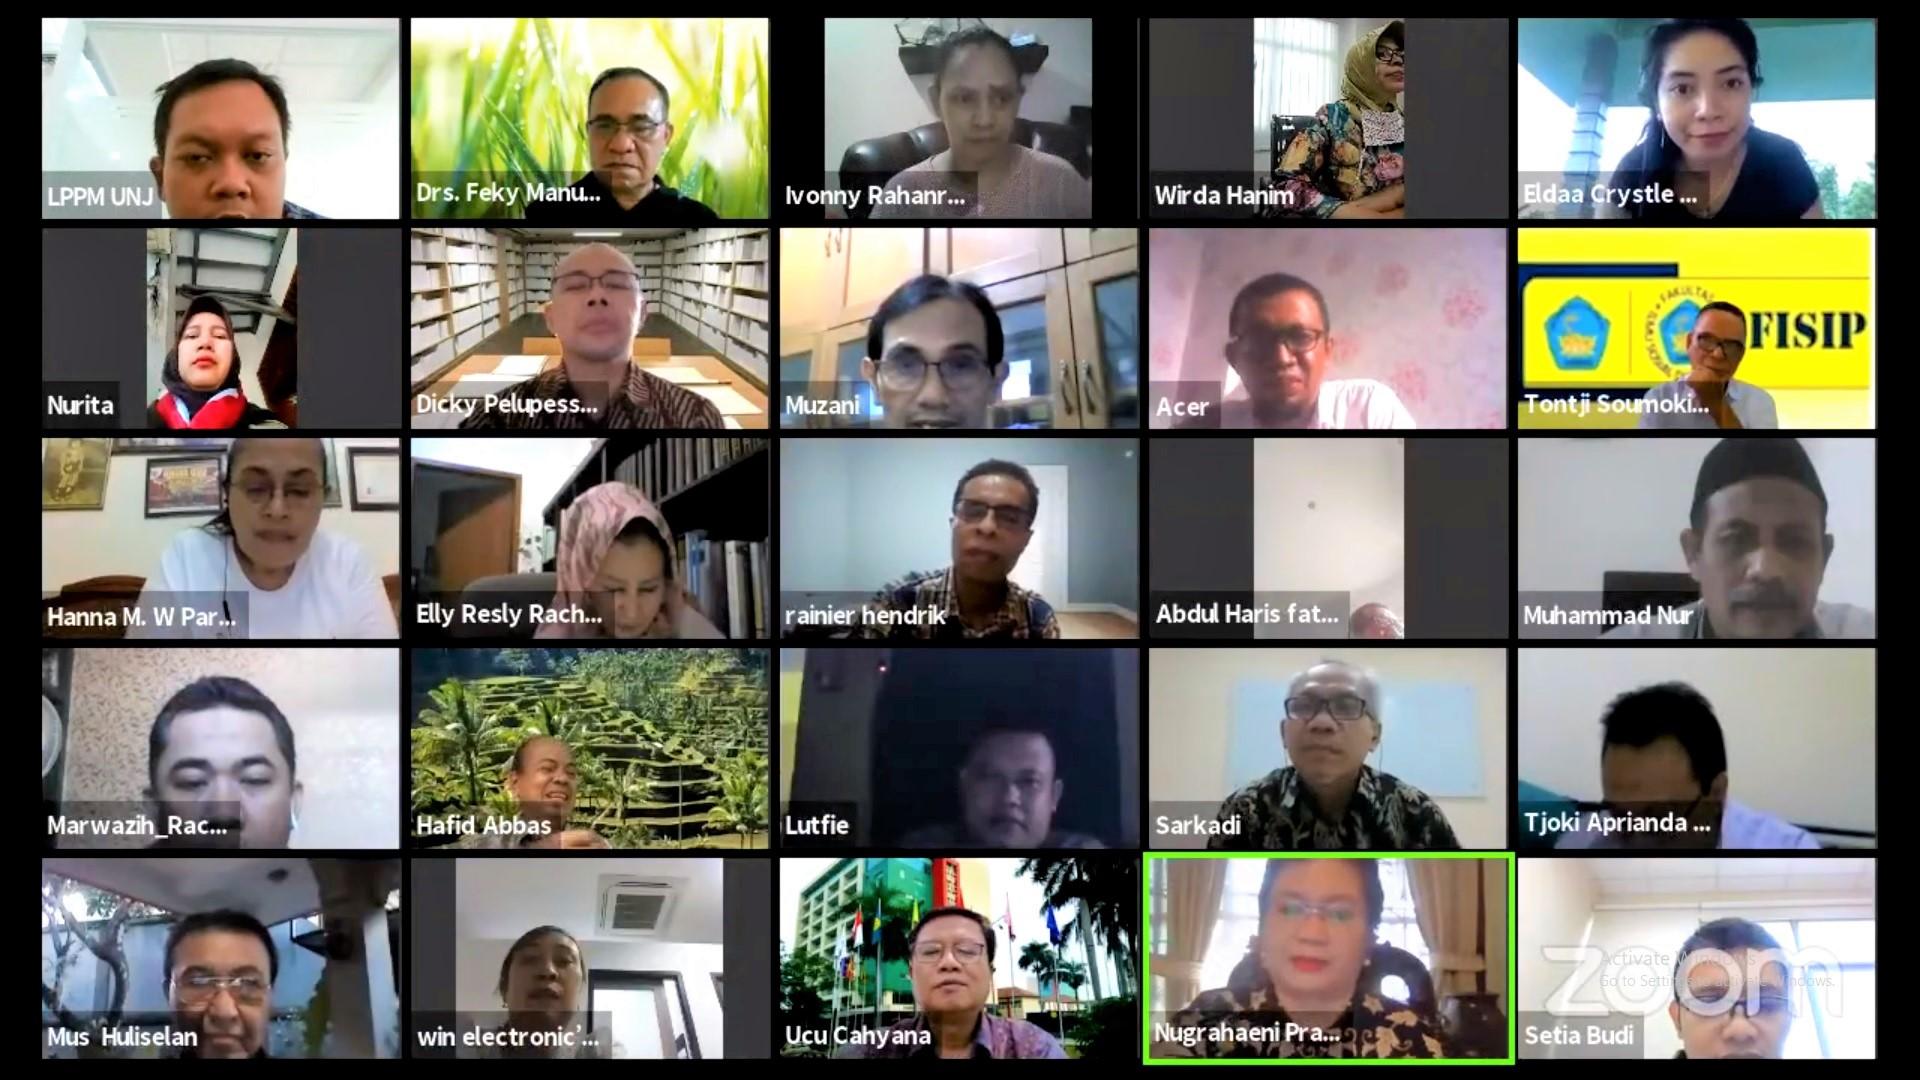 Webinar Nasional LPPM UNJ : Peranan Kampus dalam Misi Kemanusiaan di Masa Pandemi Covid-19